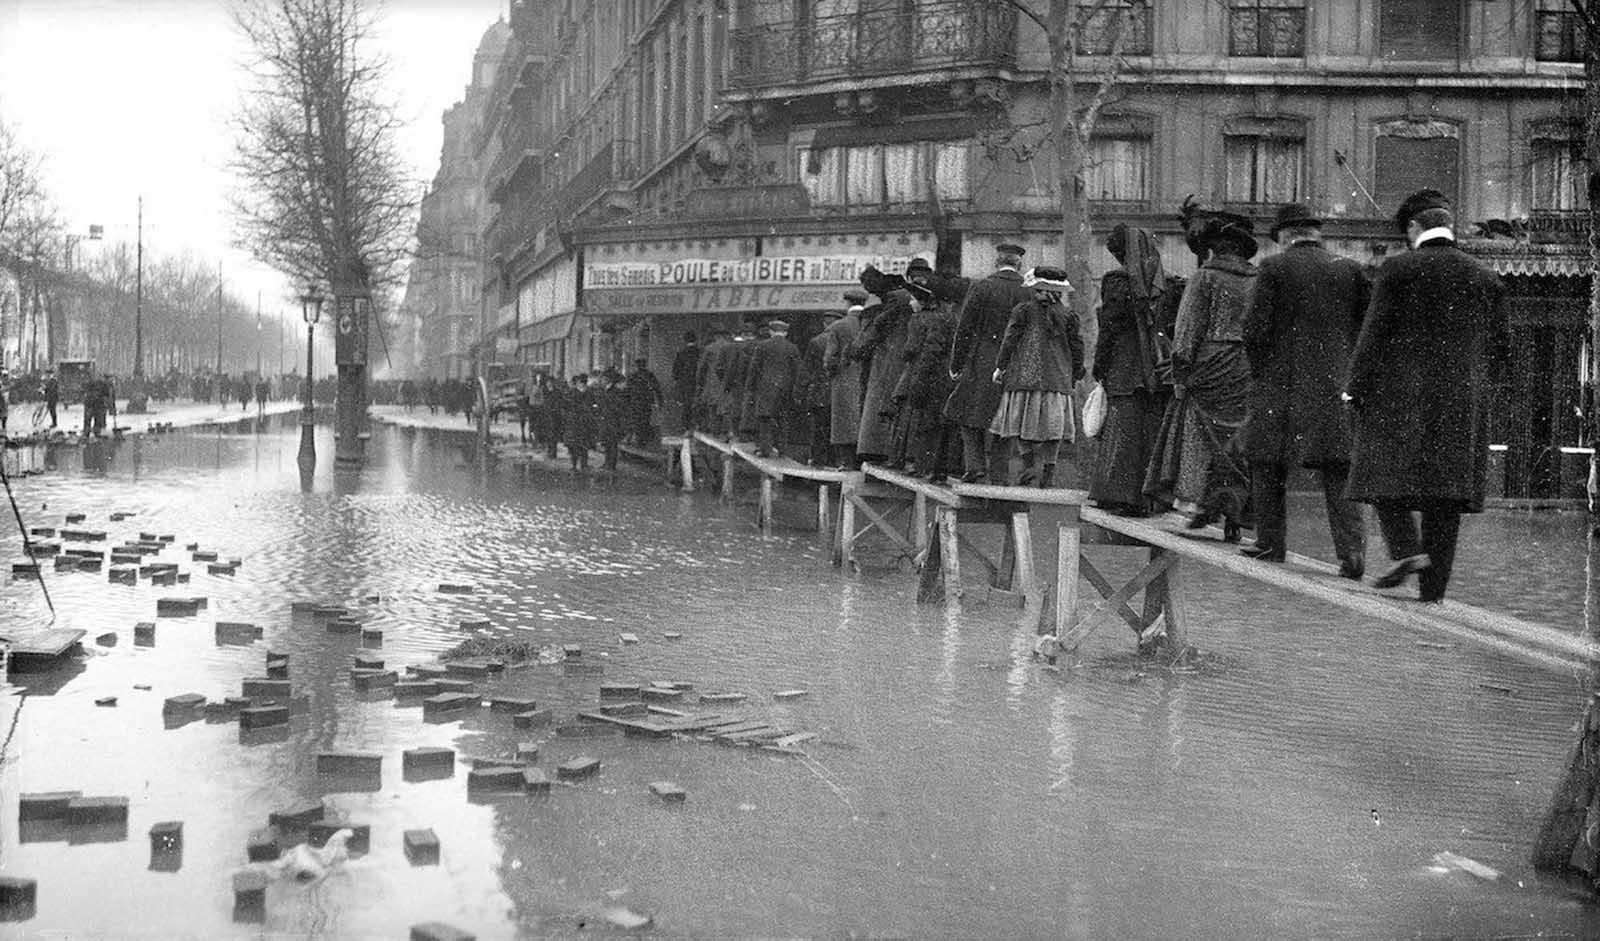 Avenue Daumesnil.